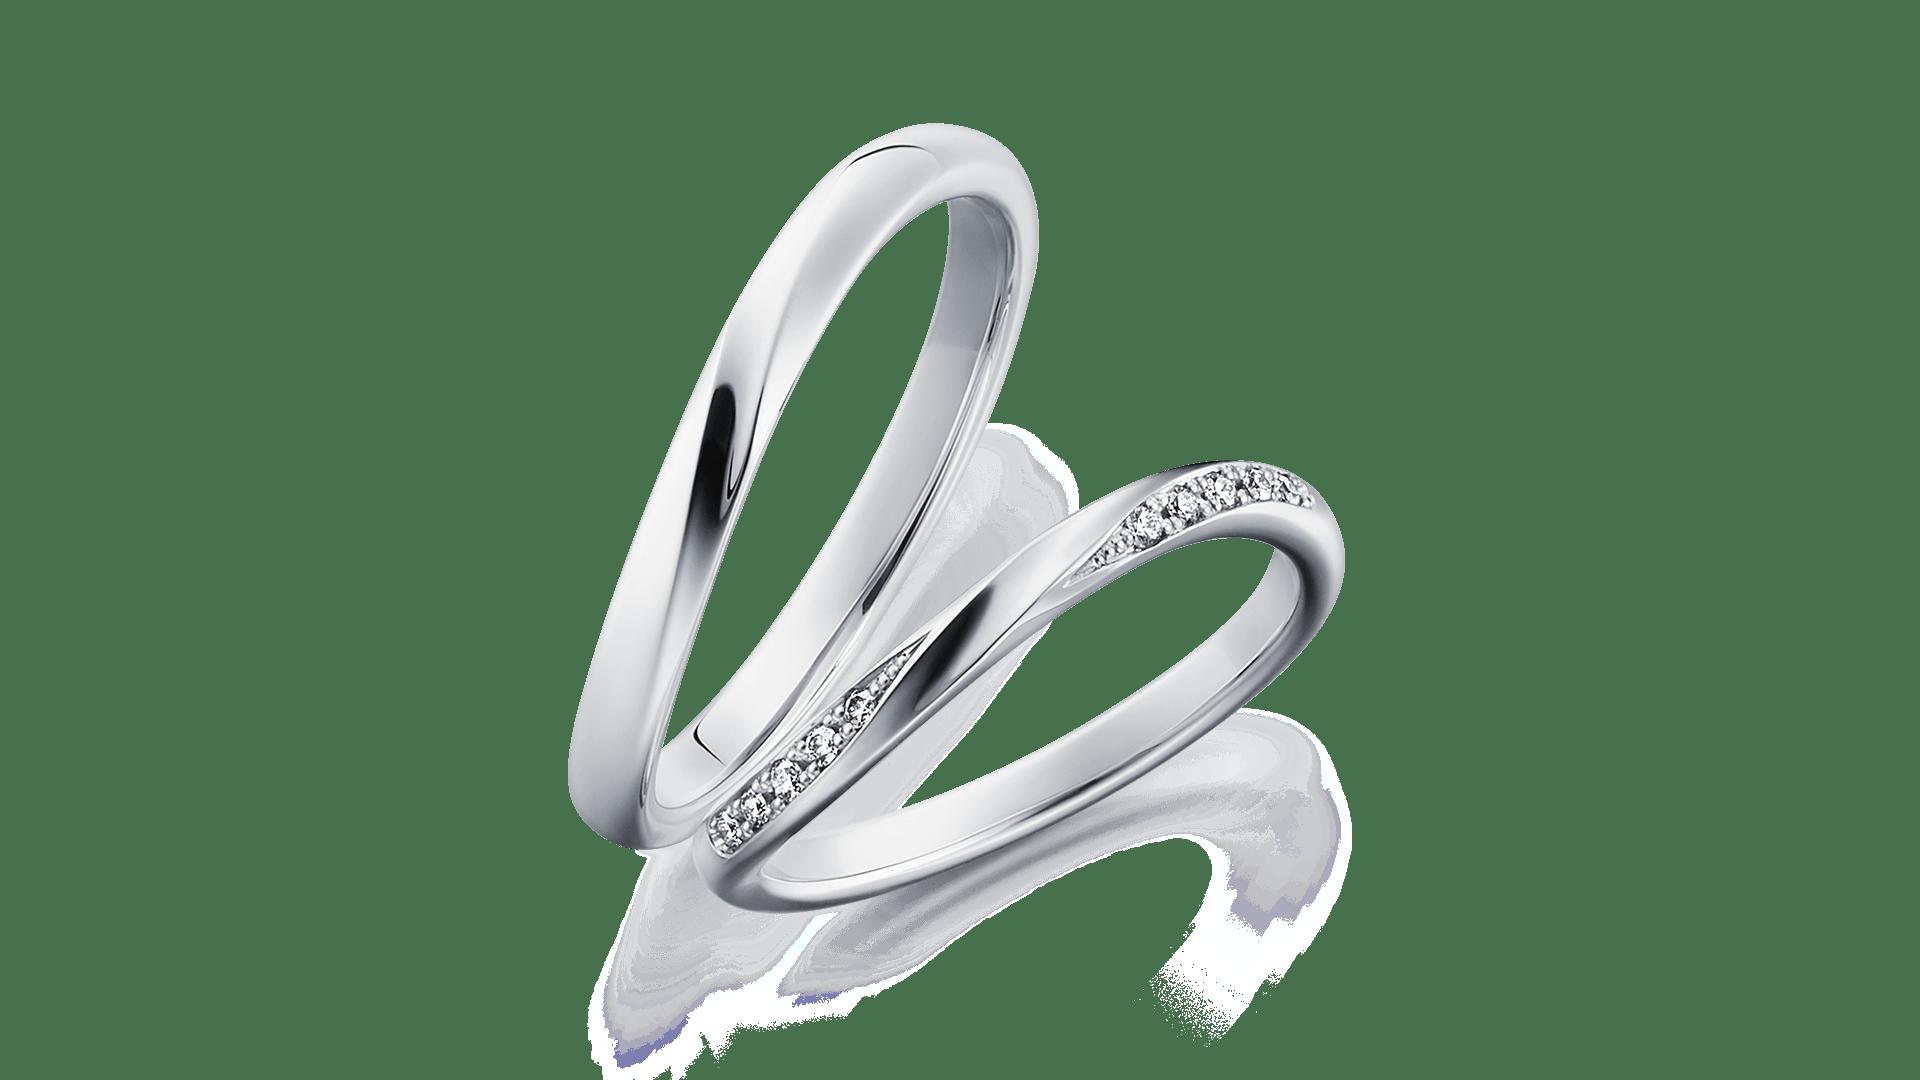 perseus ペルセウス | 結婚指輪サムネイル 2